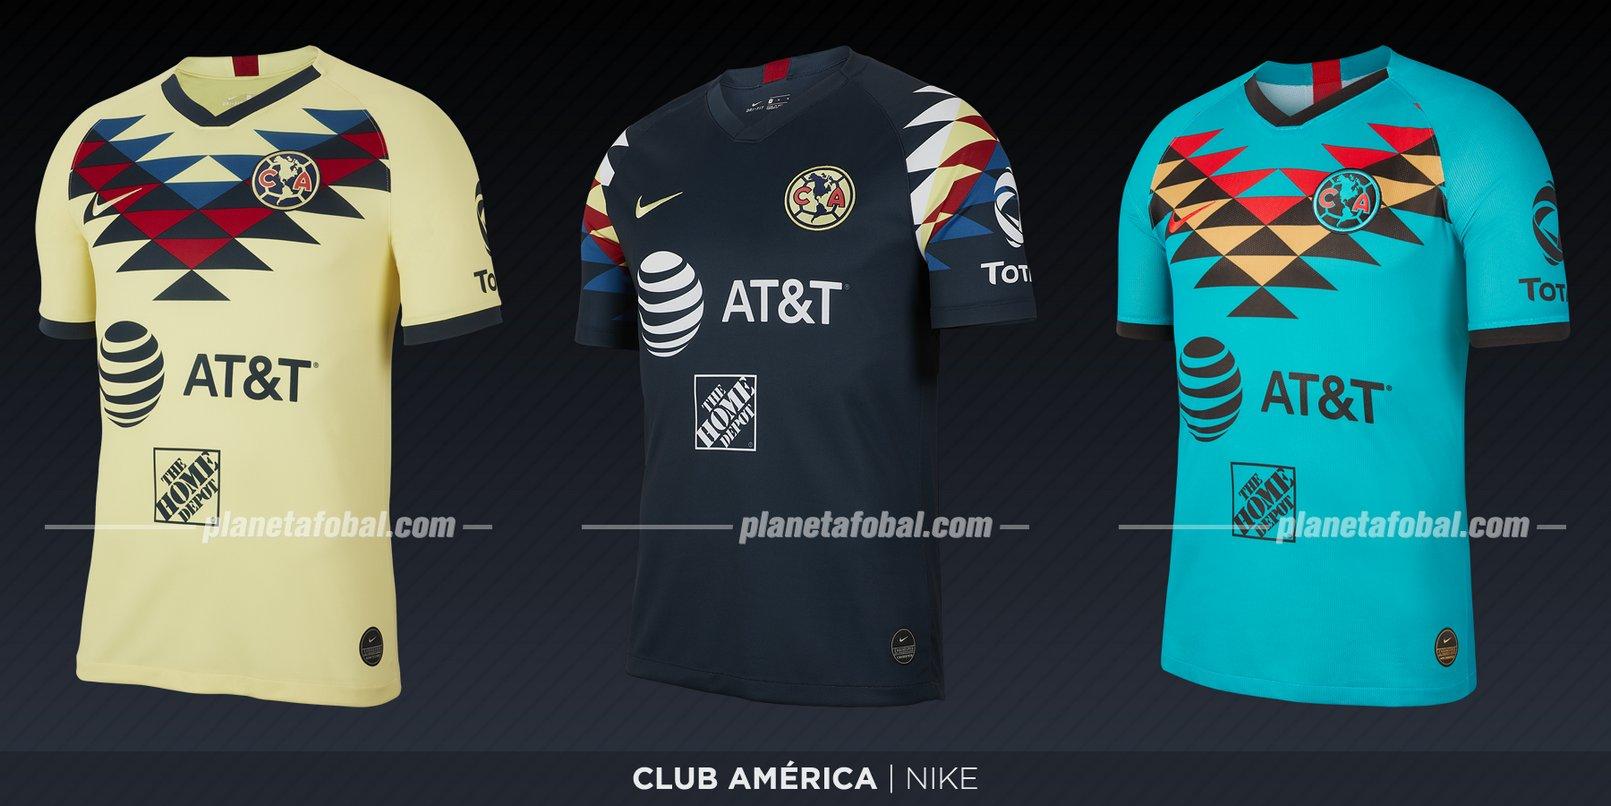 Club América (Nike) | Camisetas de la Liga MX 2019-2020